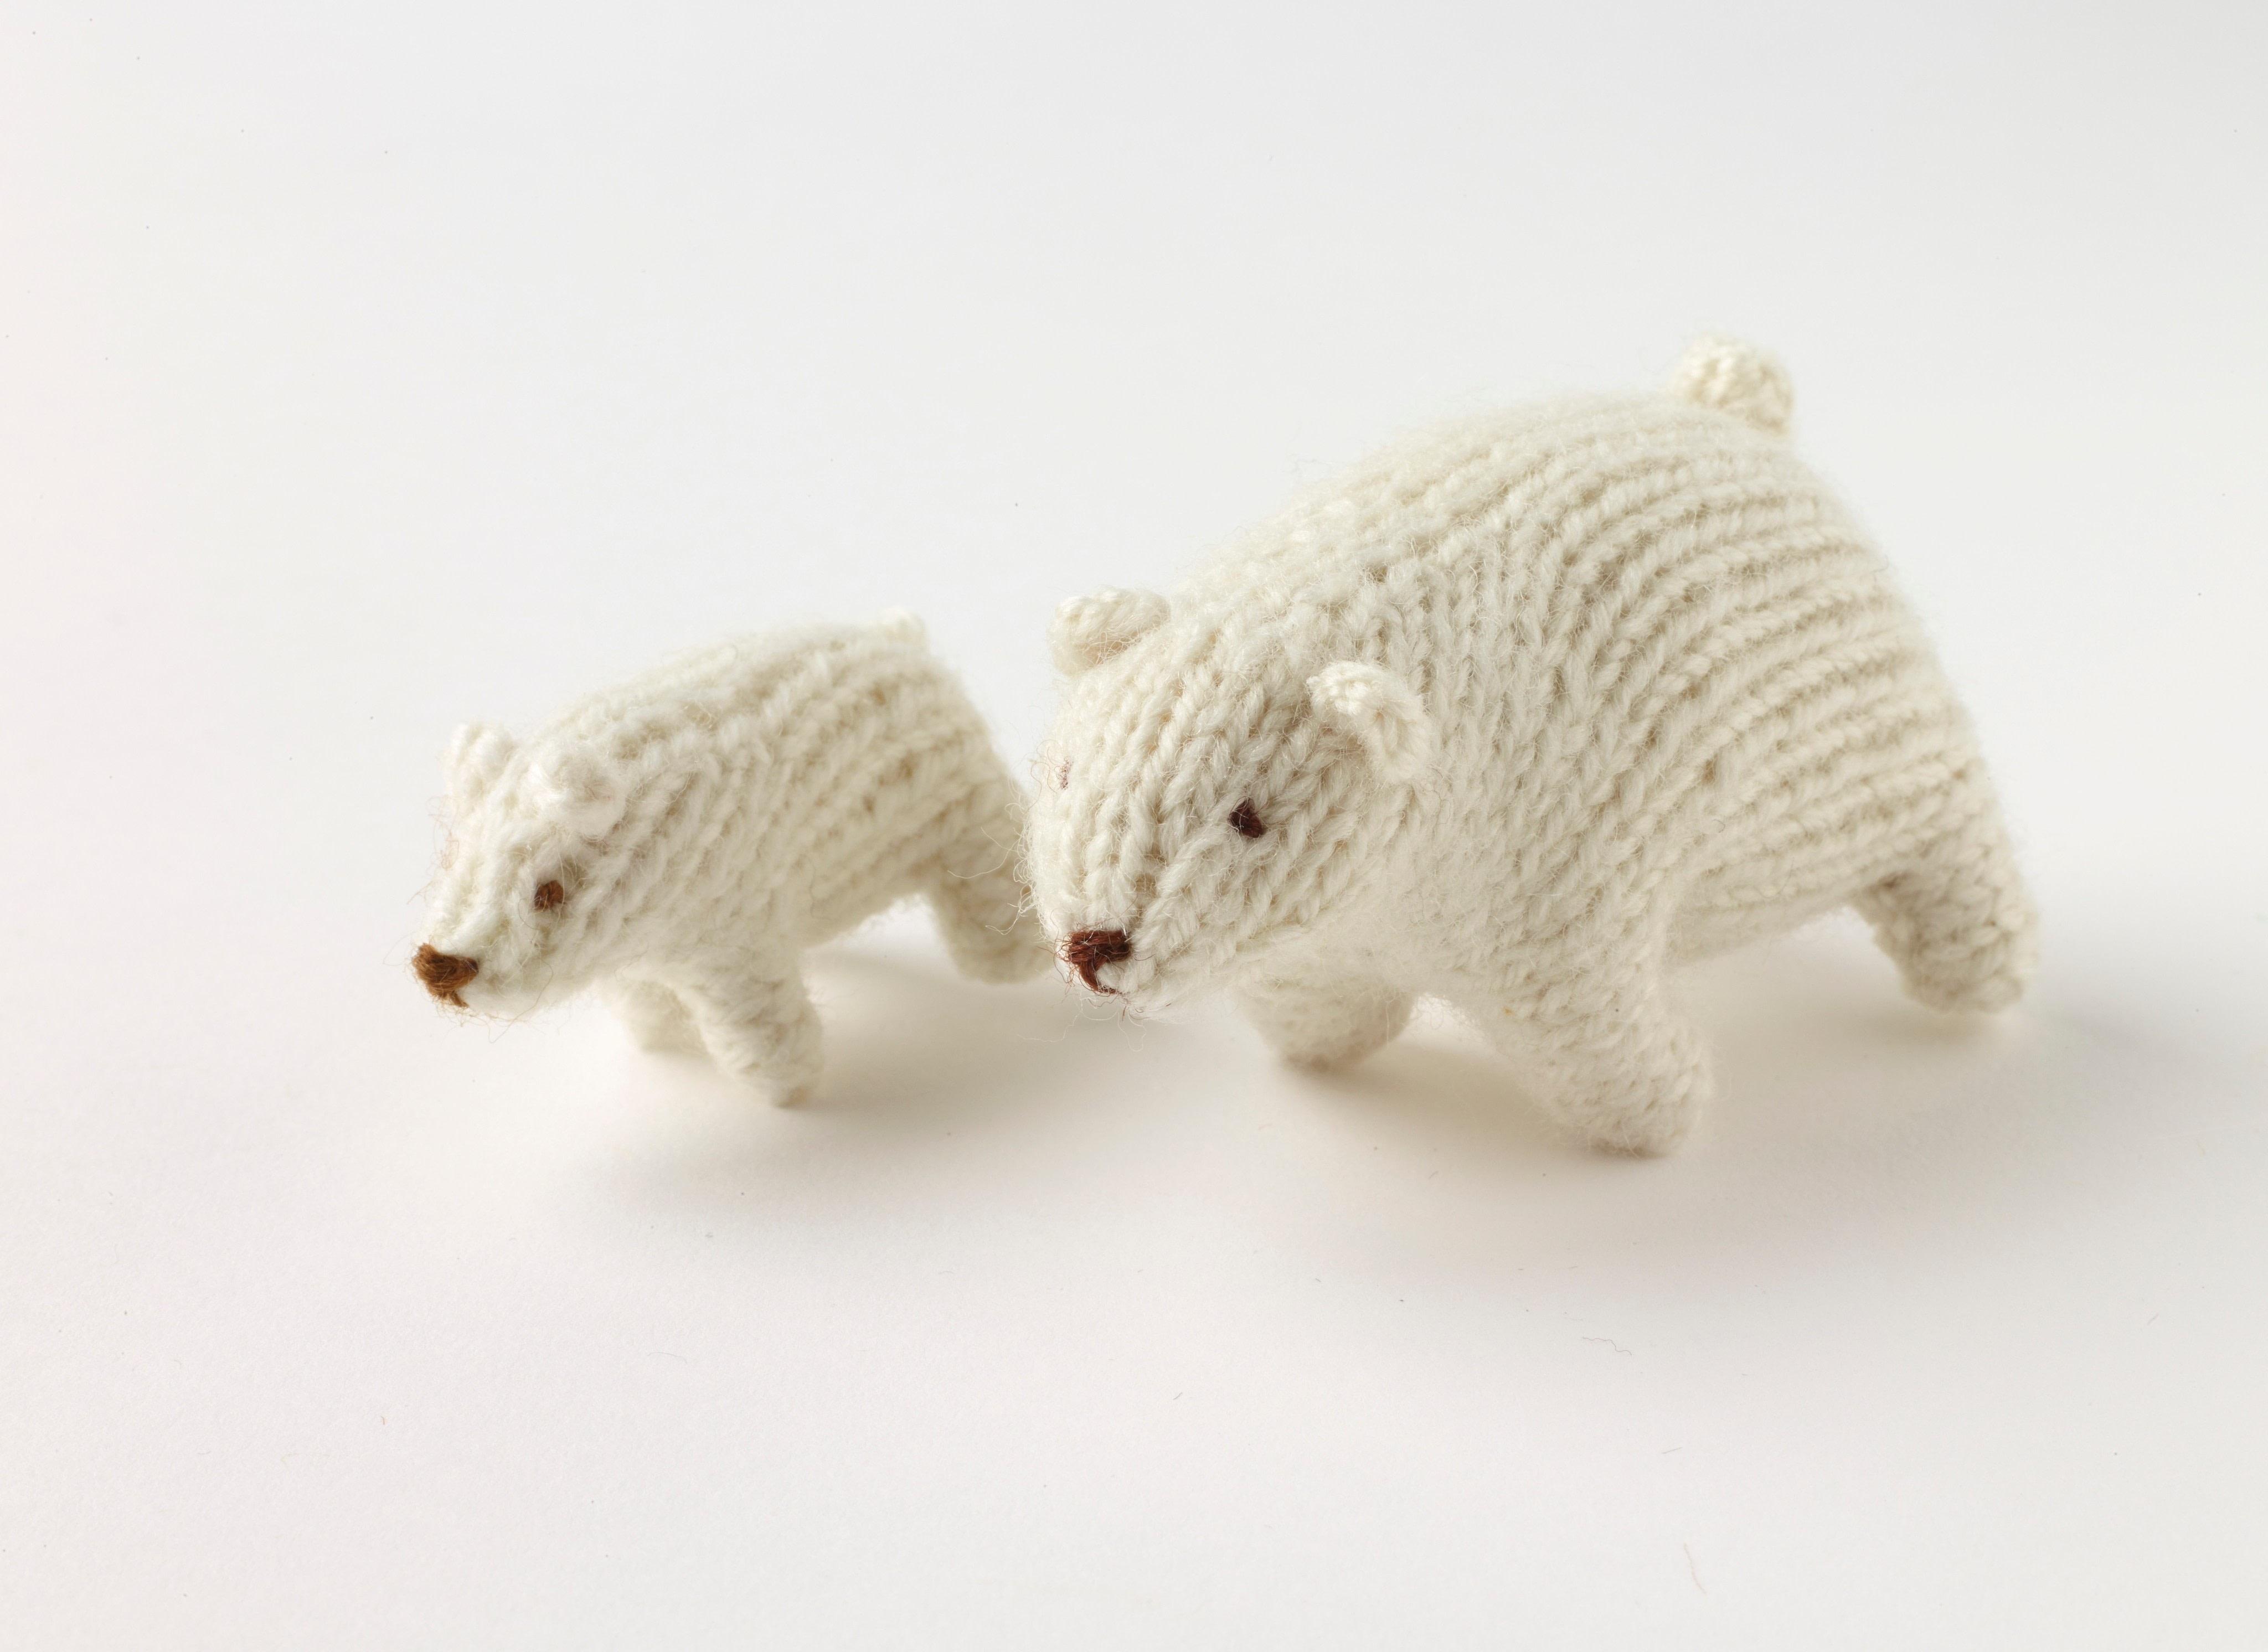 Polar Bear 183 Extract From Mini Knitted Safari By Sachiyo